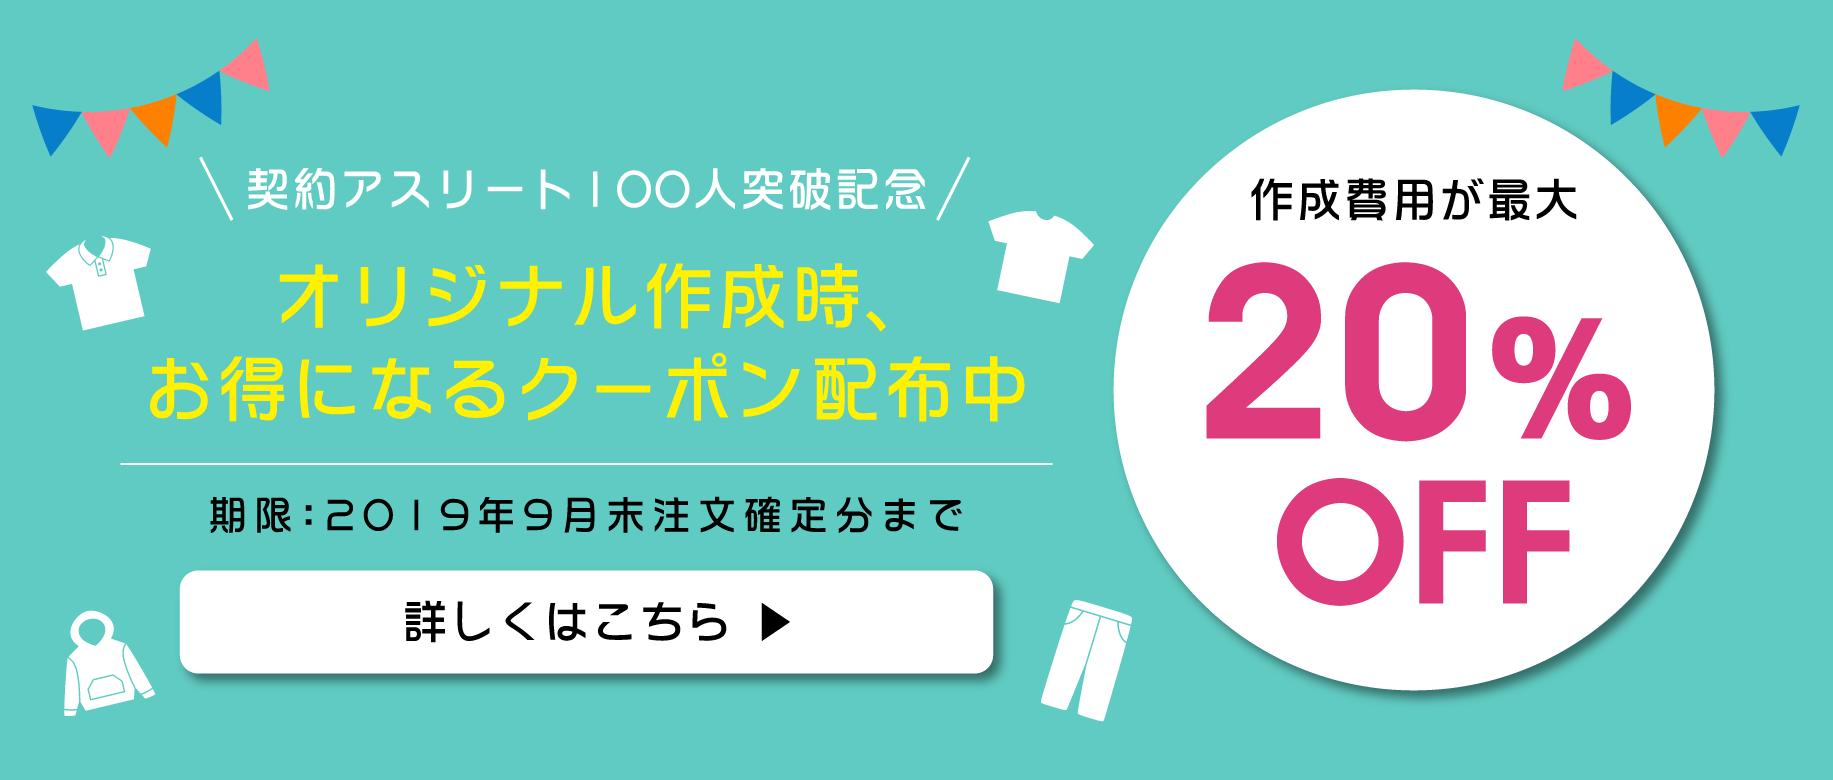 20%OFFCP_main